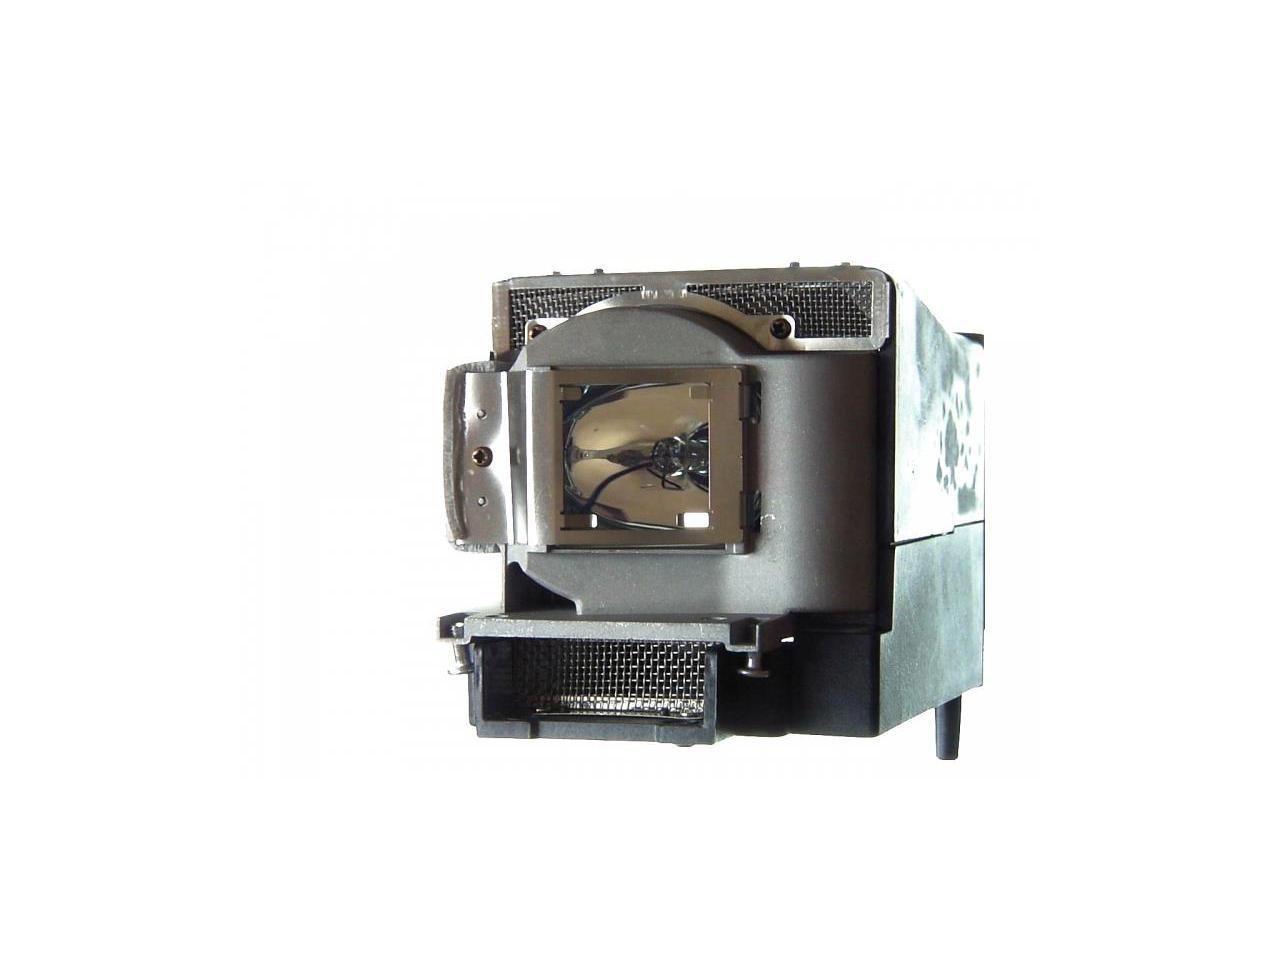 Diamond Lamps 230W Projector Lamp For Mitsubishi XD250U XD280U VLT-XD280LP-DL